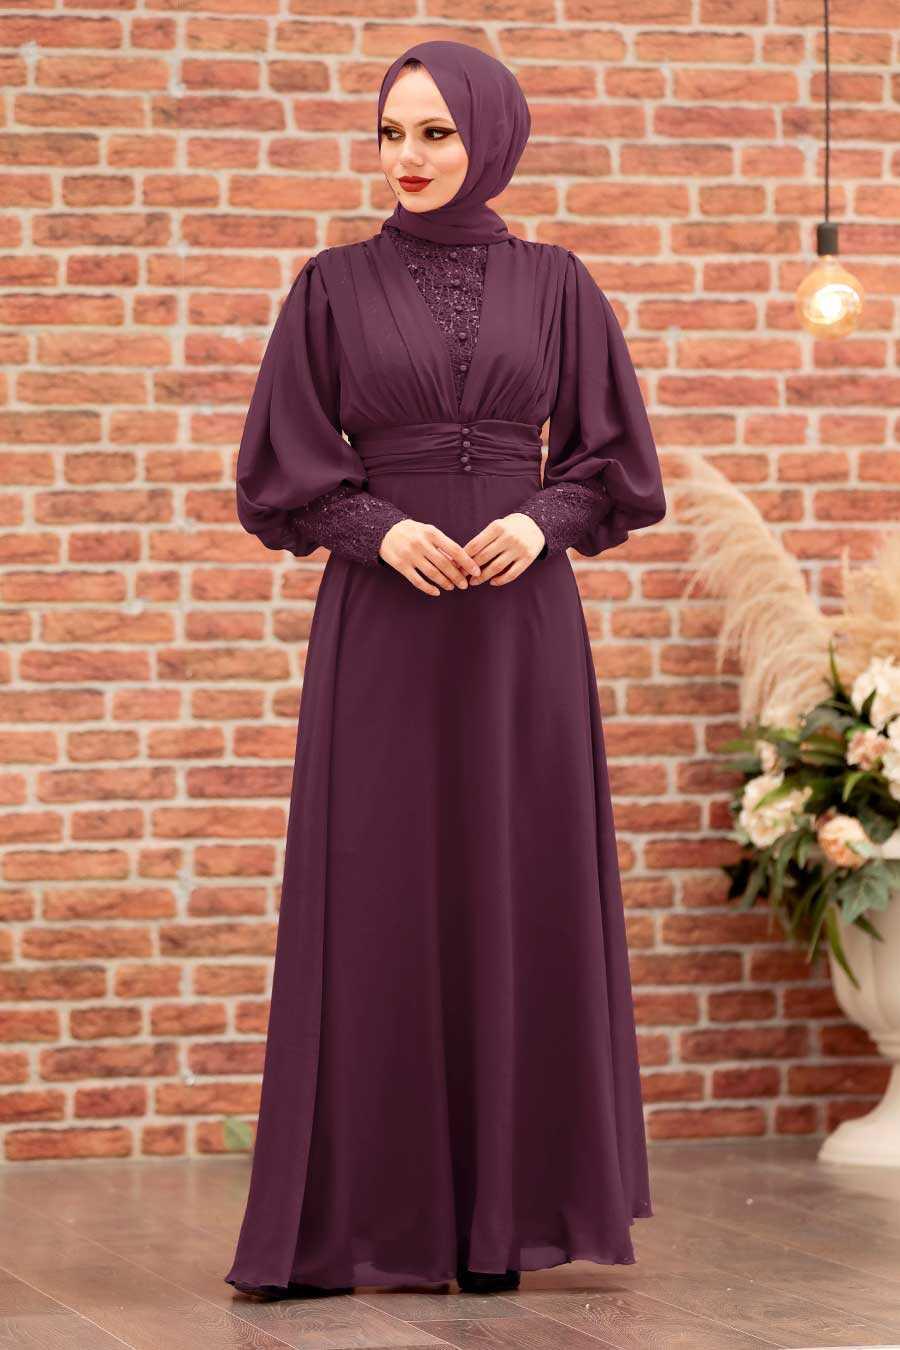 Plum Color Hijab Evening Dress 25810MU